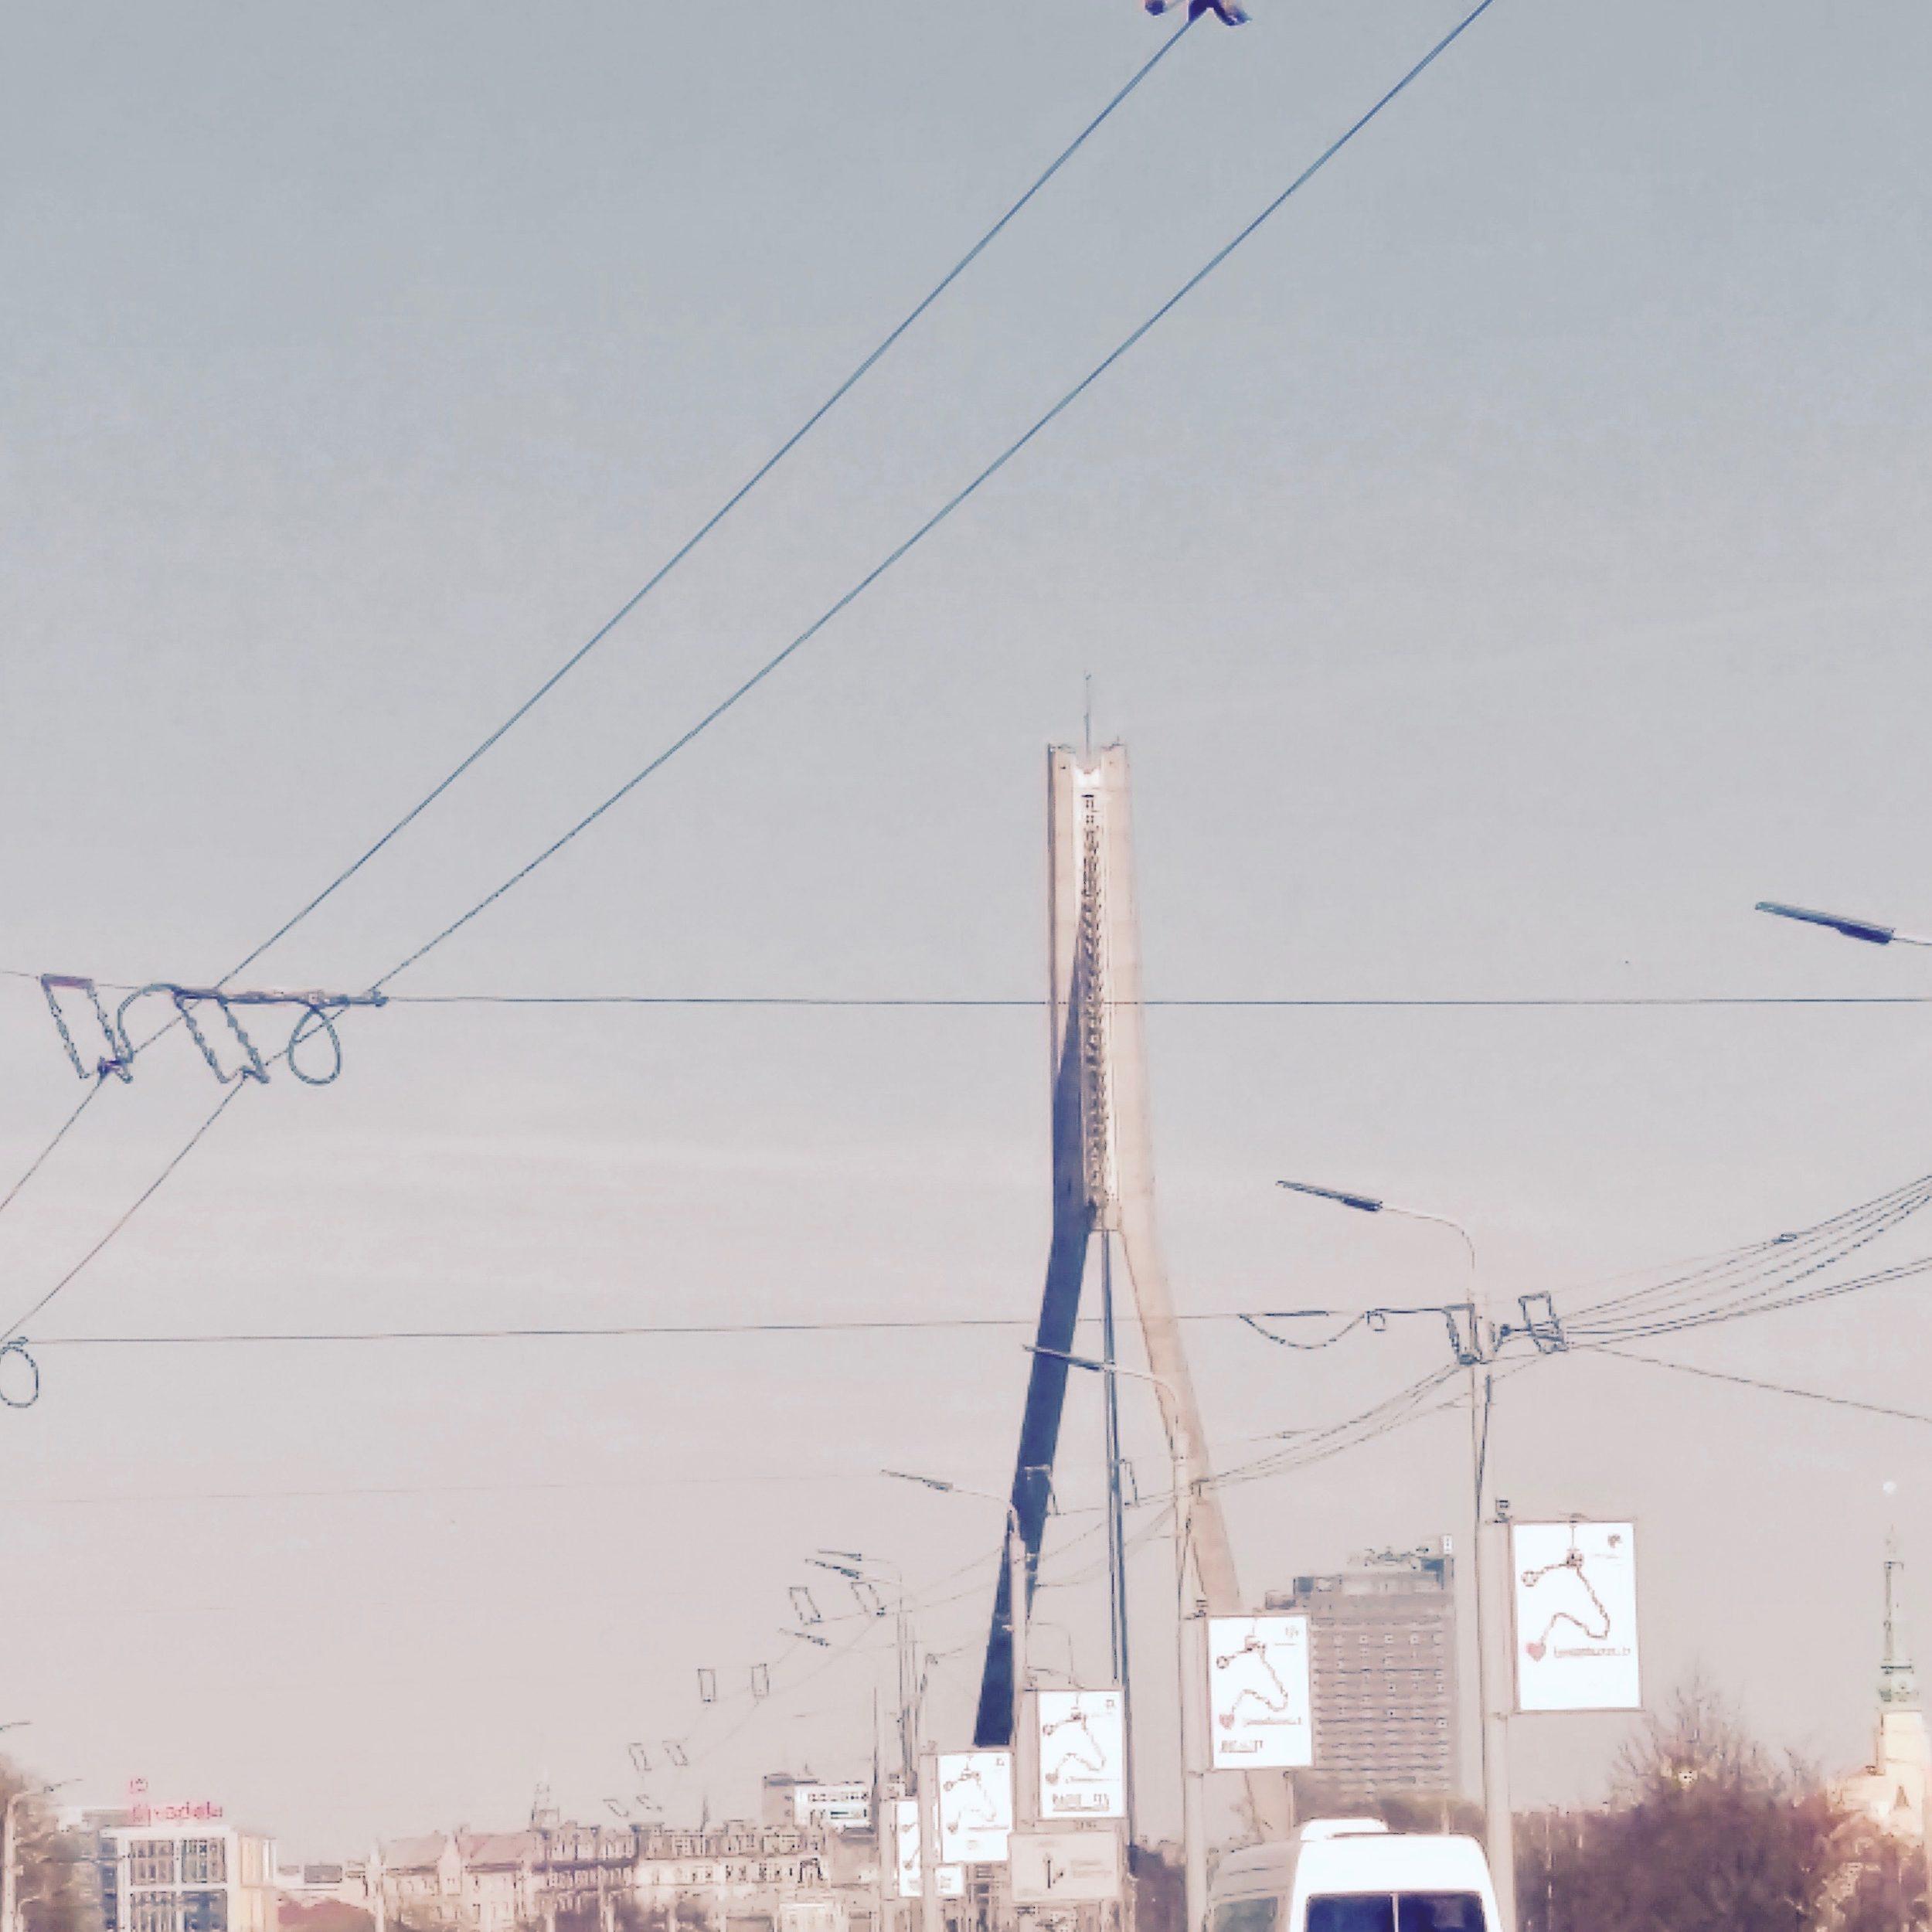 Kipsala is connected to city Center by Vanšu bridge